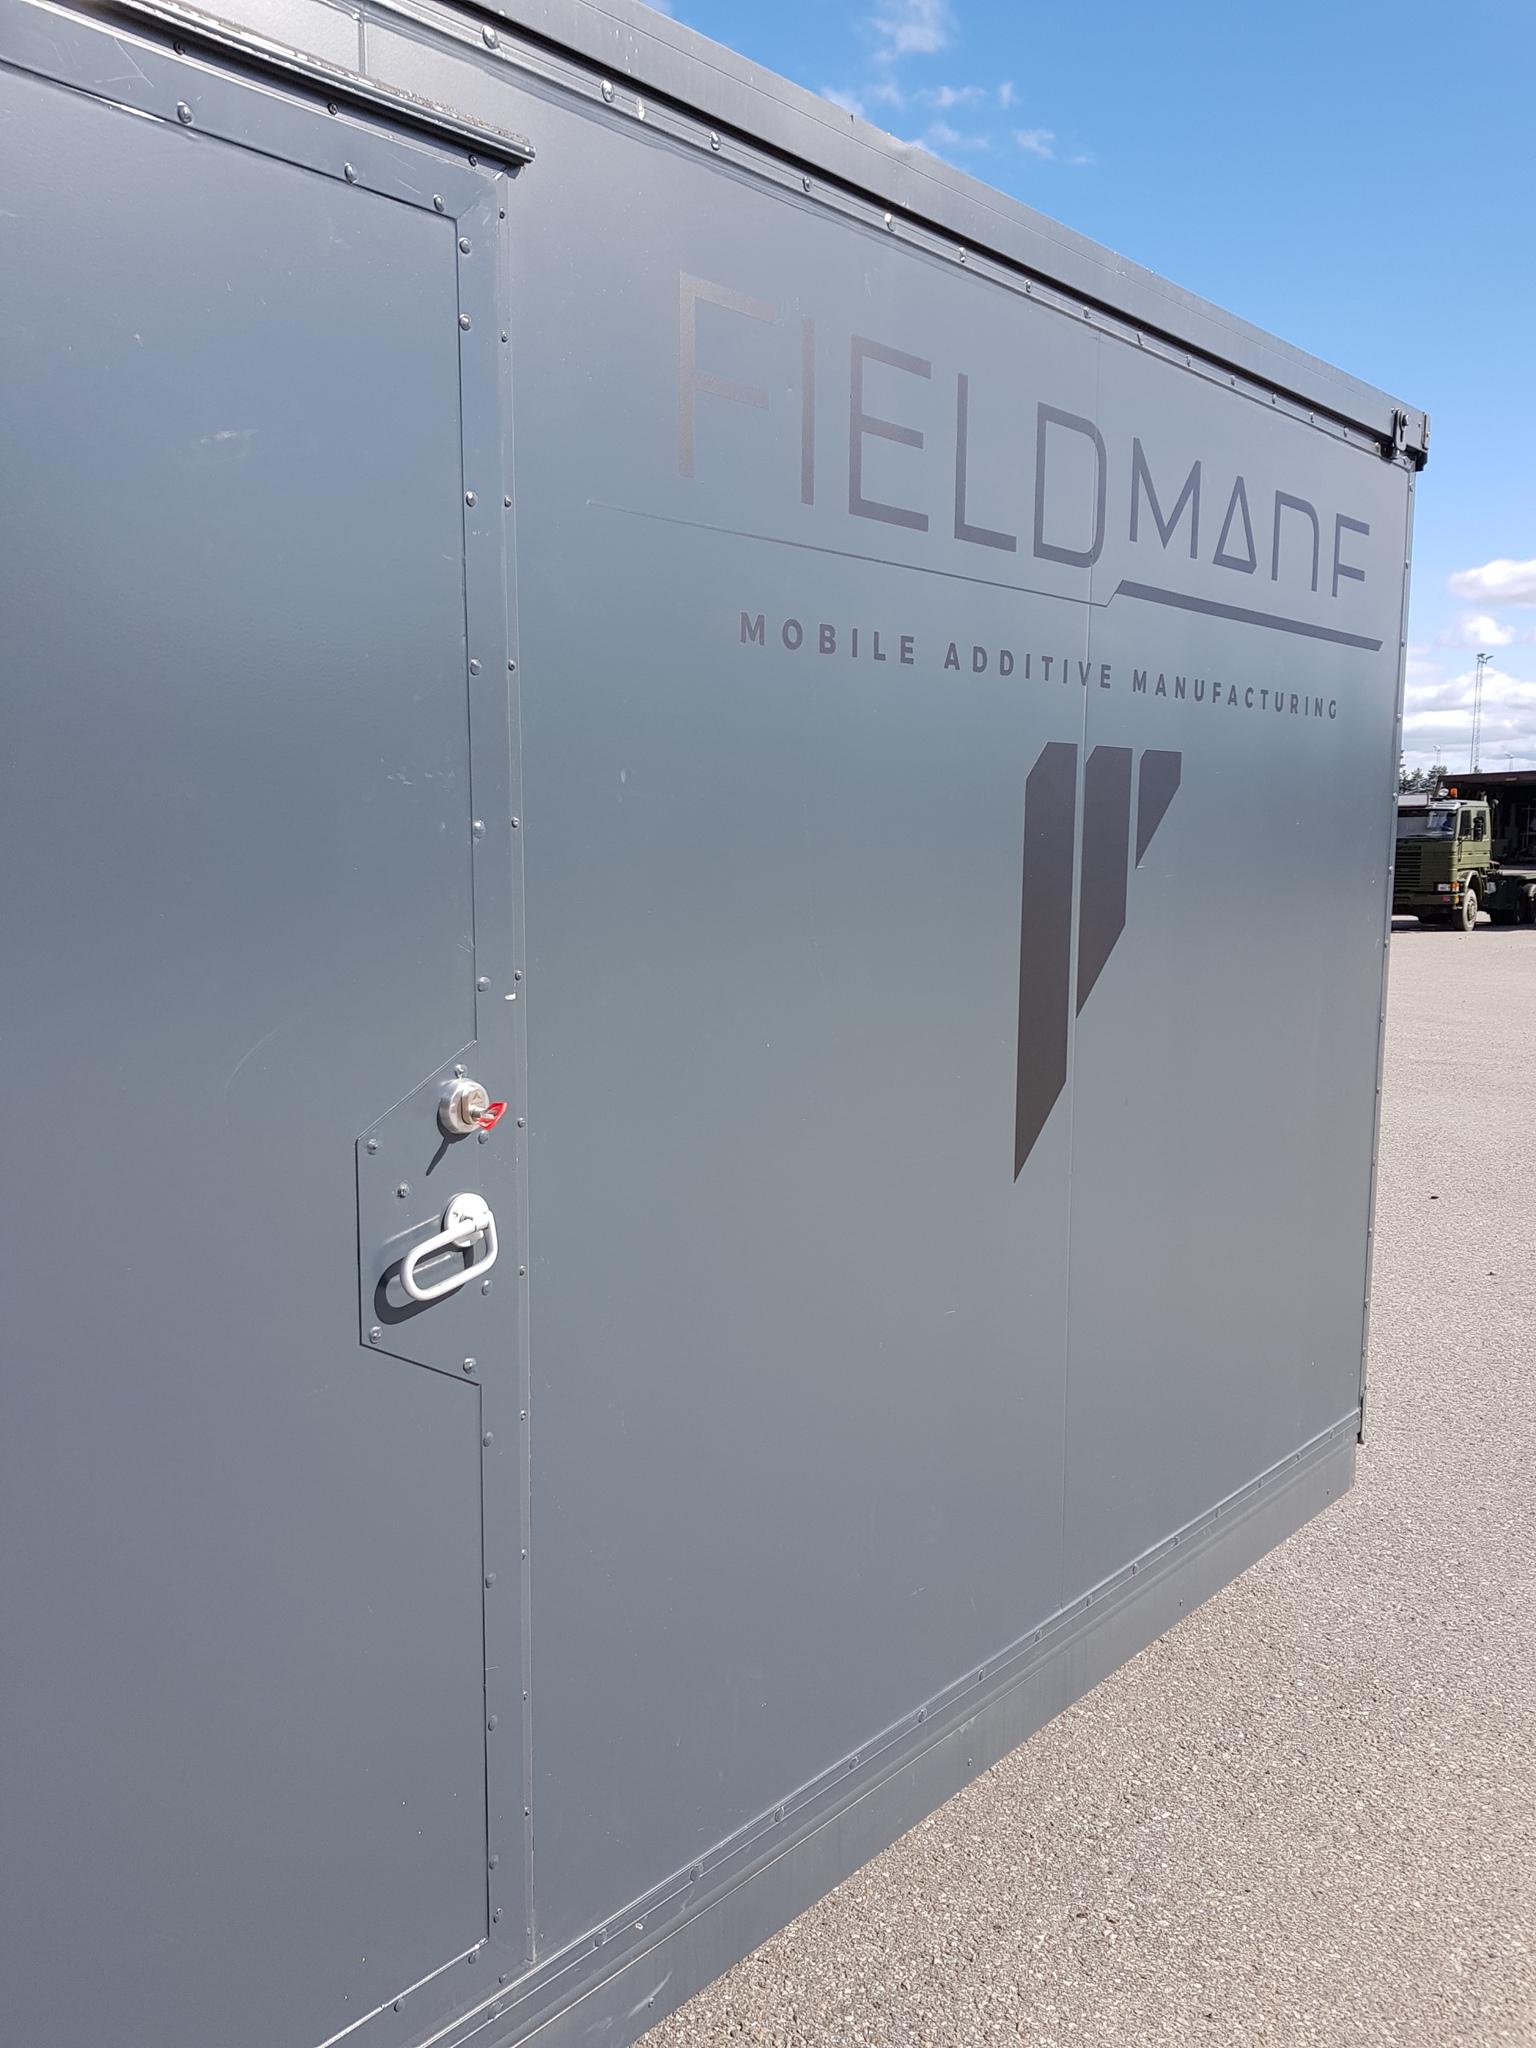 Fieldmade's NOMAD microfactory featuring an Urban Alps Stealth Key. Photo via Urban Alps.